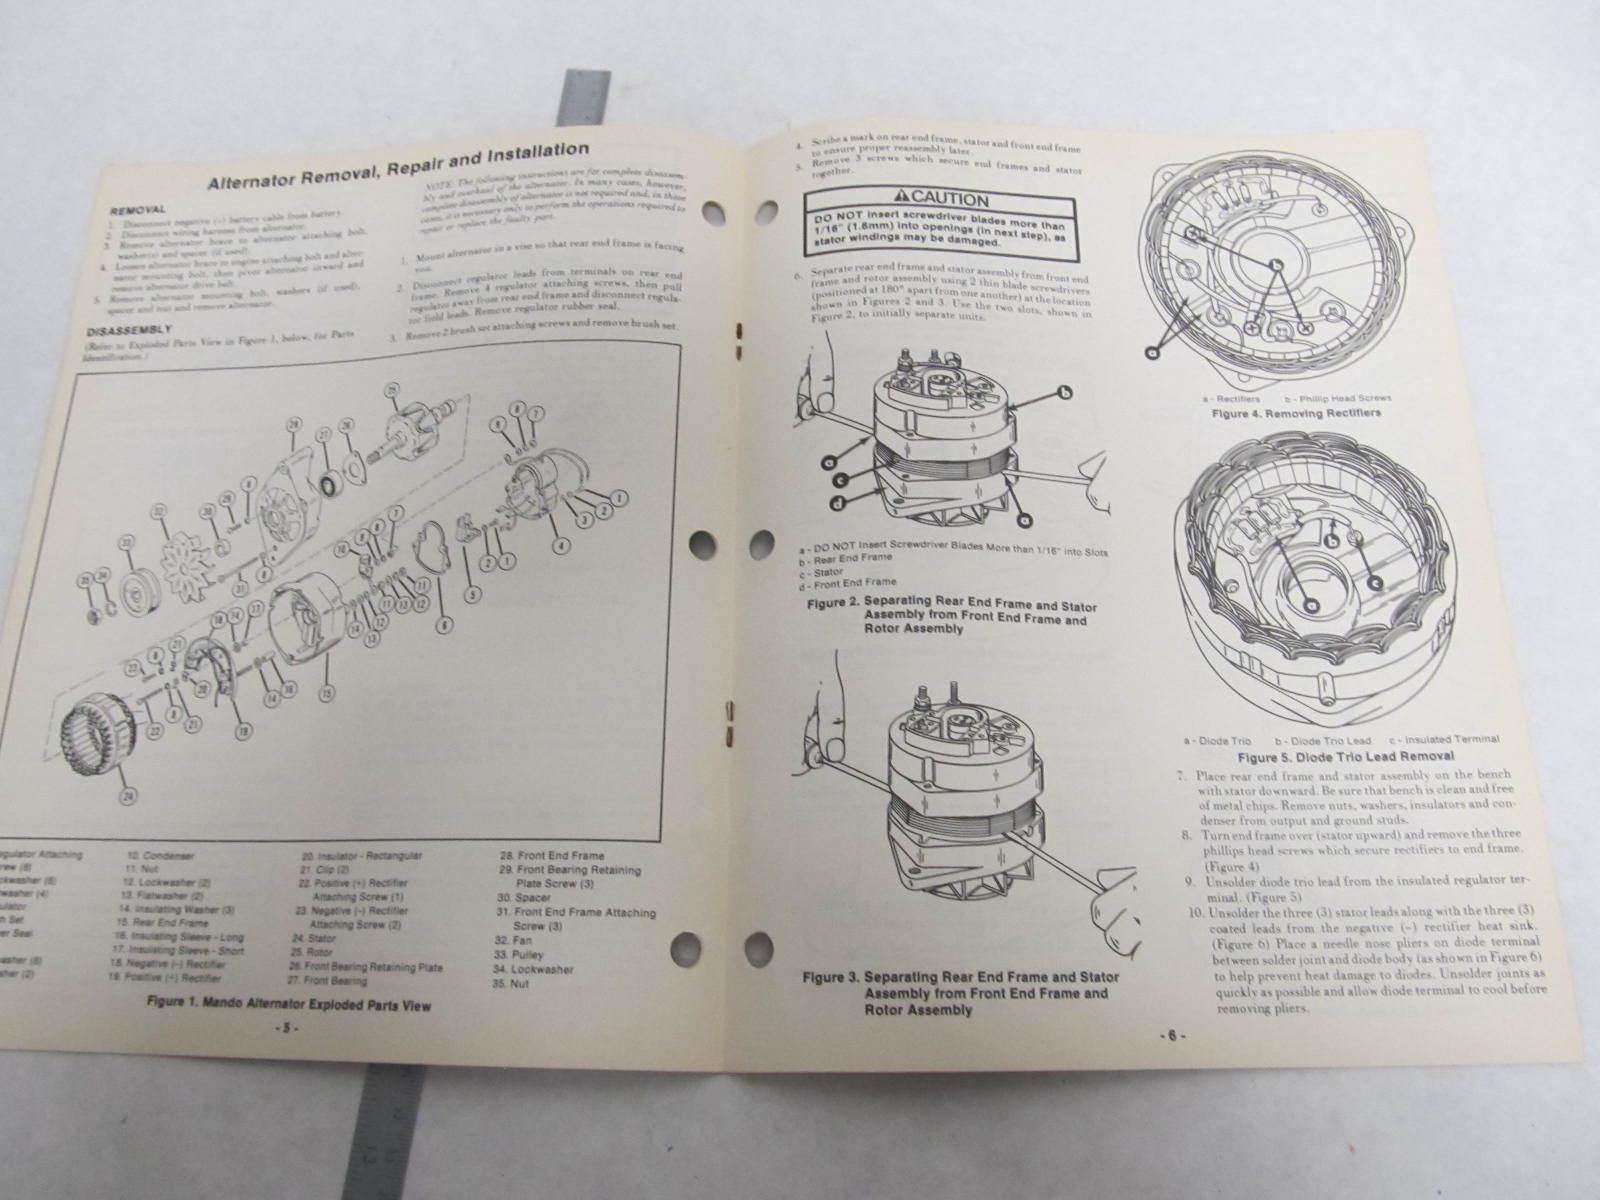 mercruiser 4.3 lx service manual